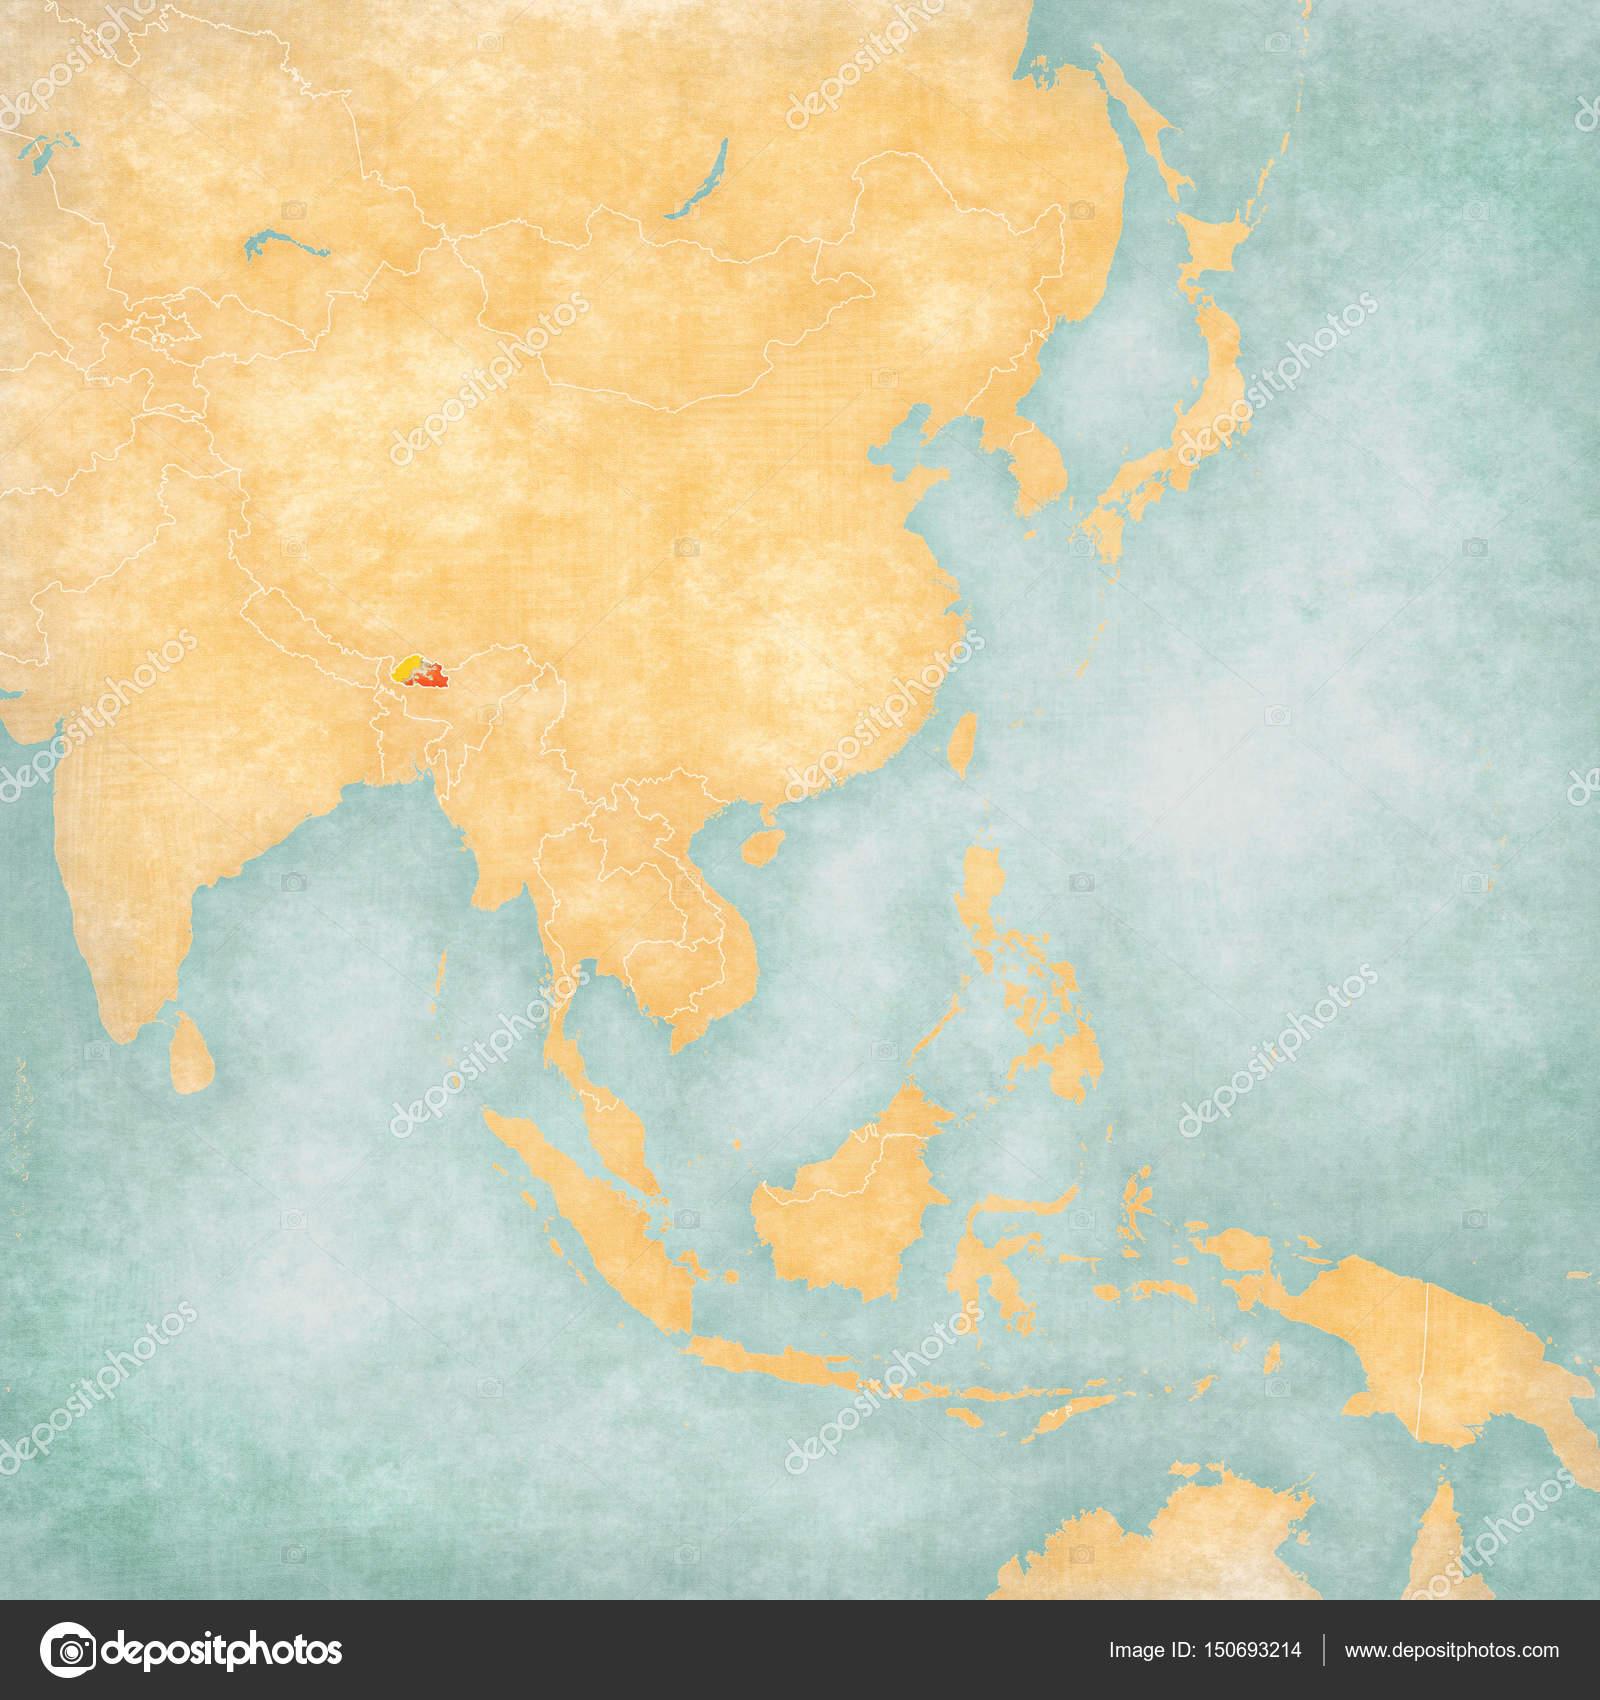 Carte Asie Bhoutan.Carte De L Asie Bhoutan Photographie Tindo C 150693214